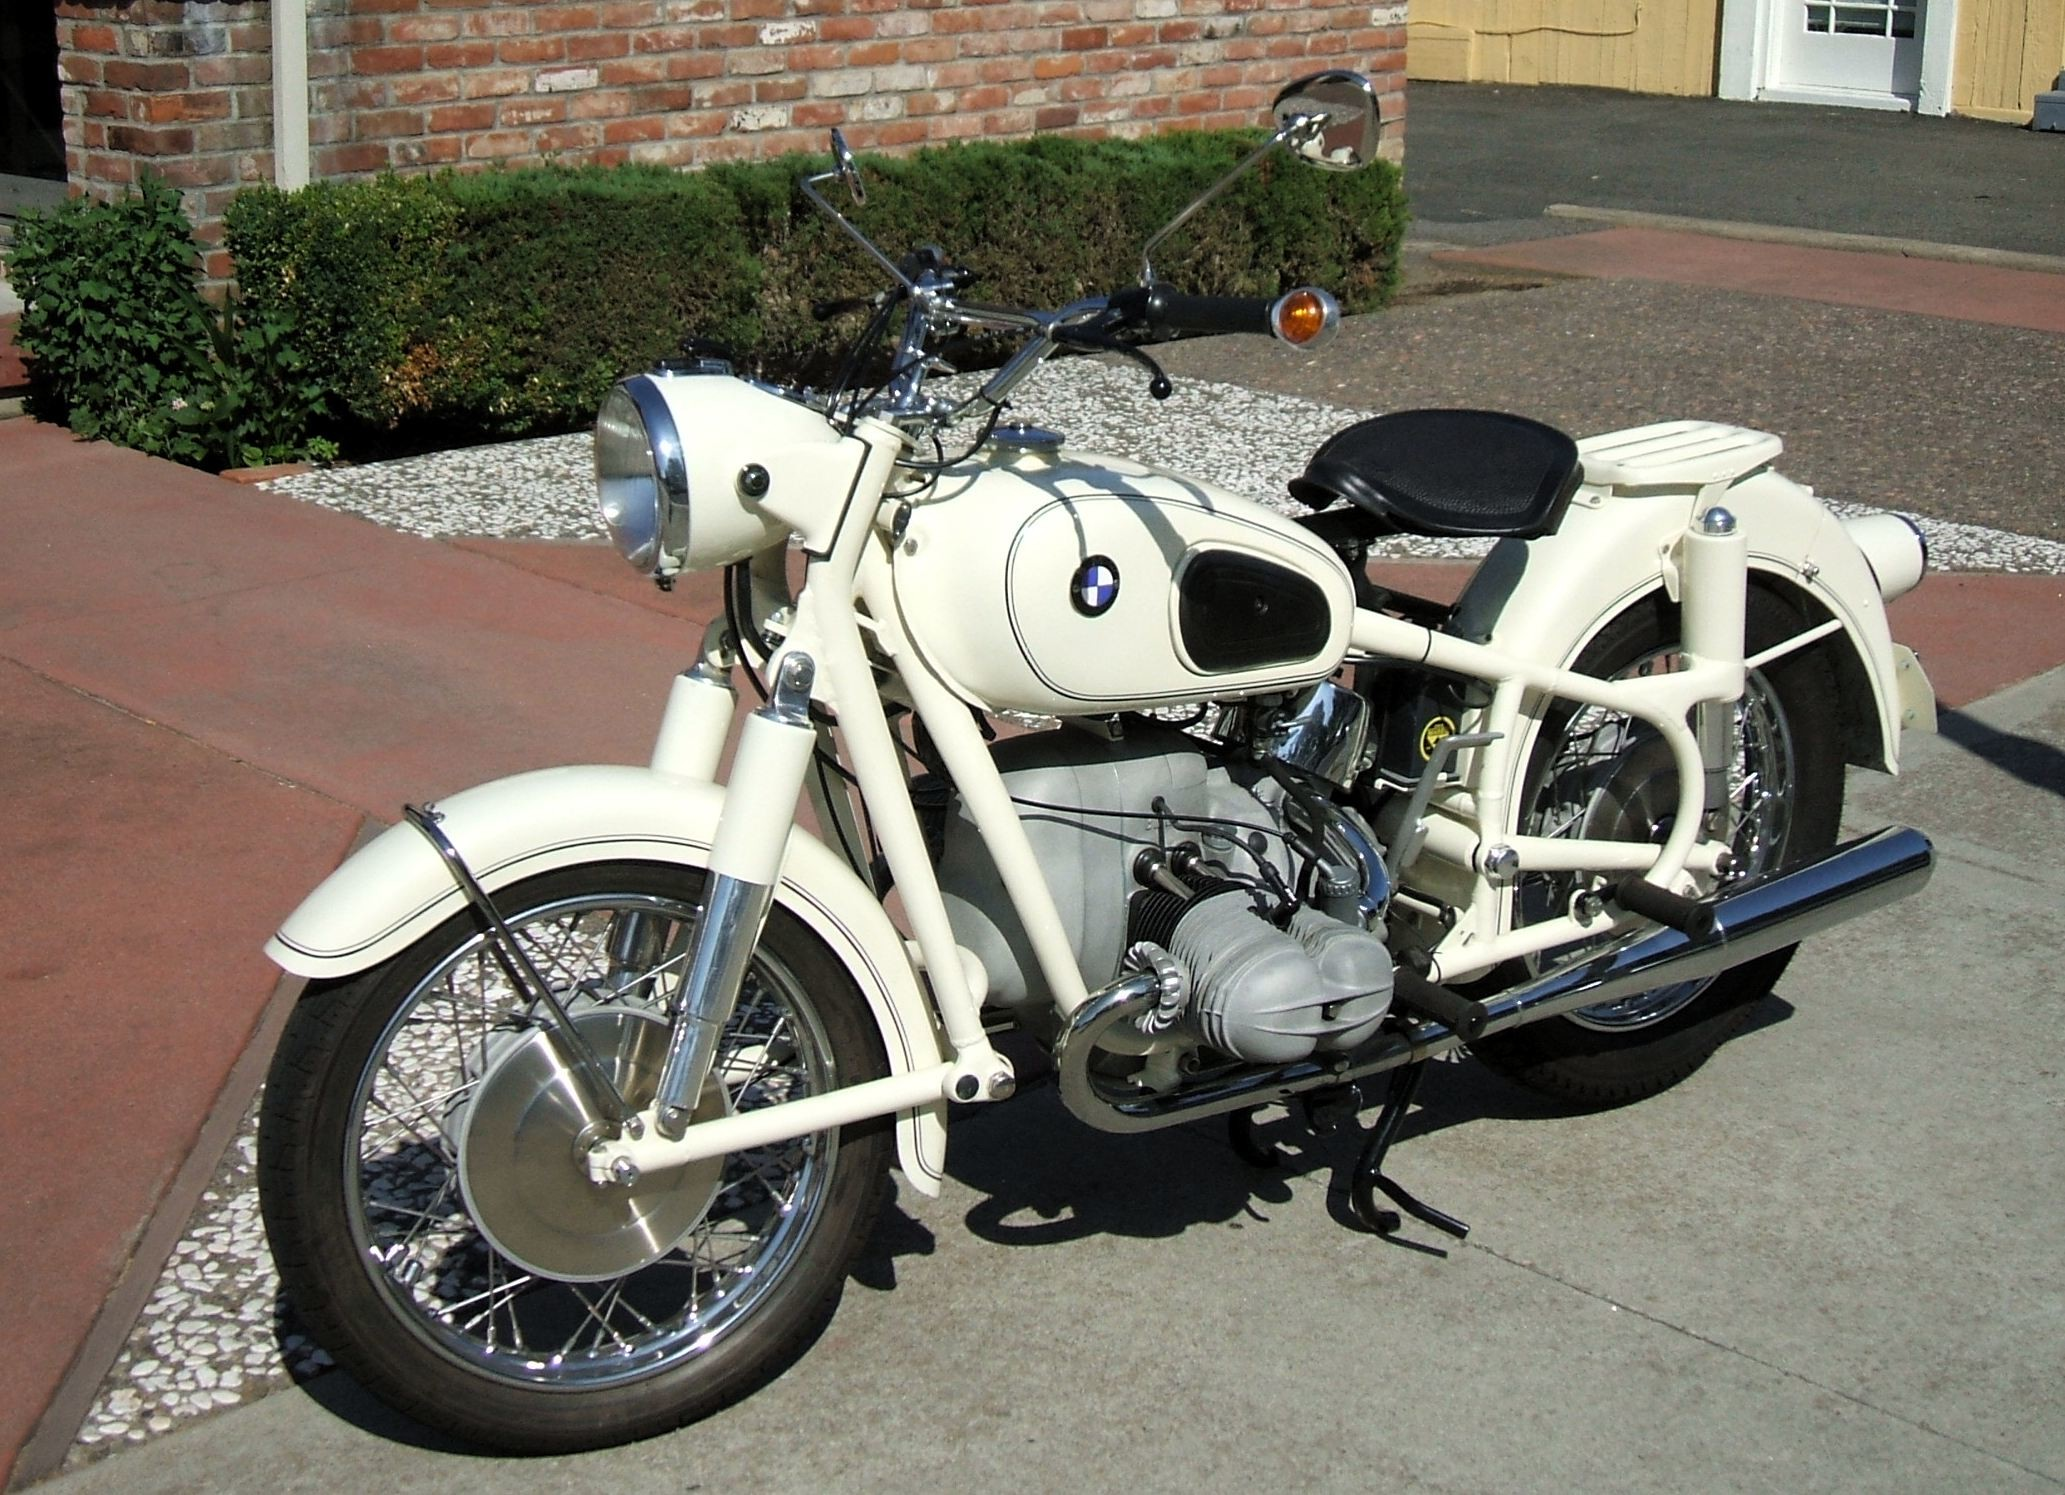 Vintage Motorcycle Wallpaper (66+ images)